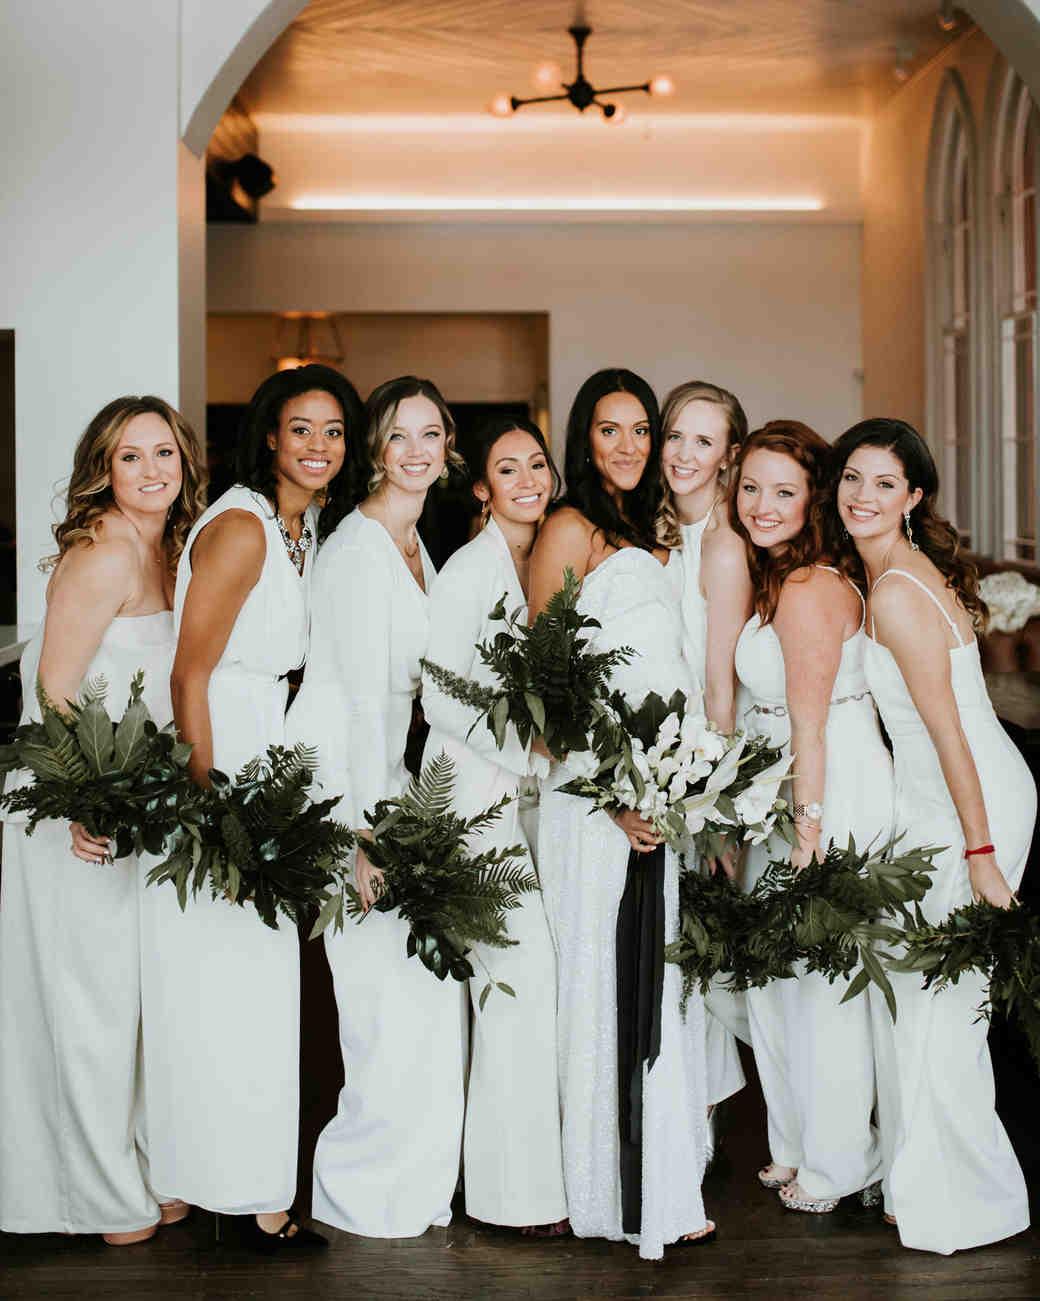 women wearing white bridesmaids jumpsuits holding greenery bouqets